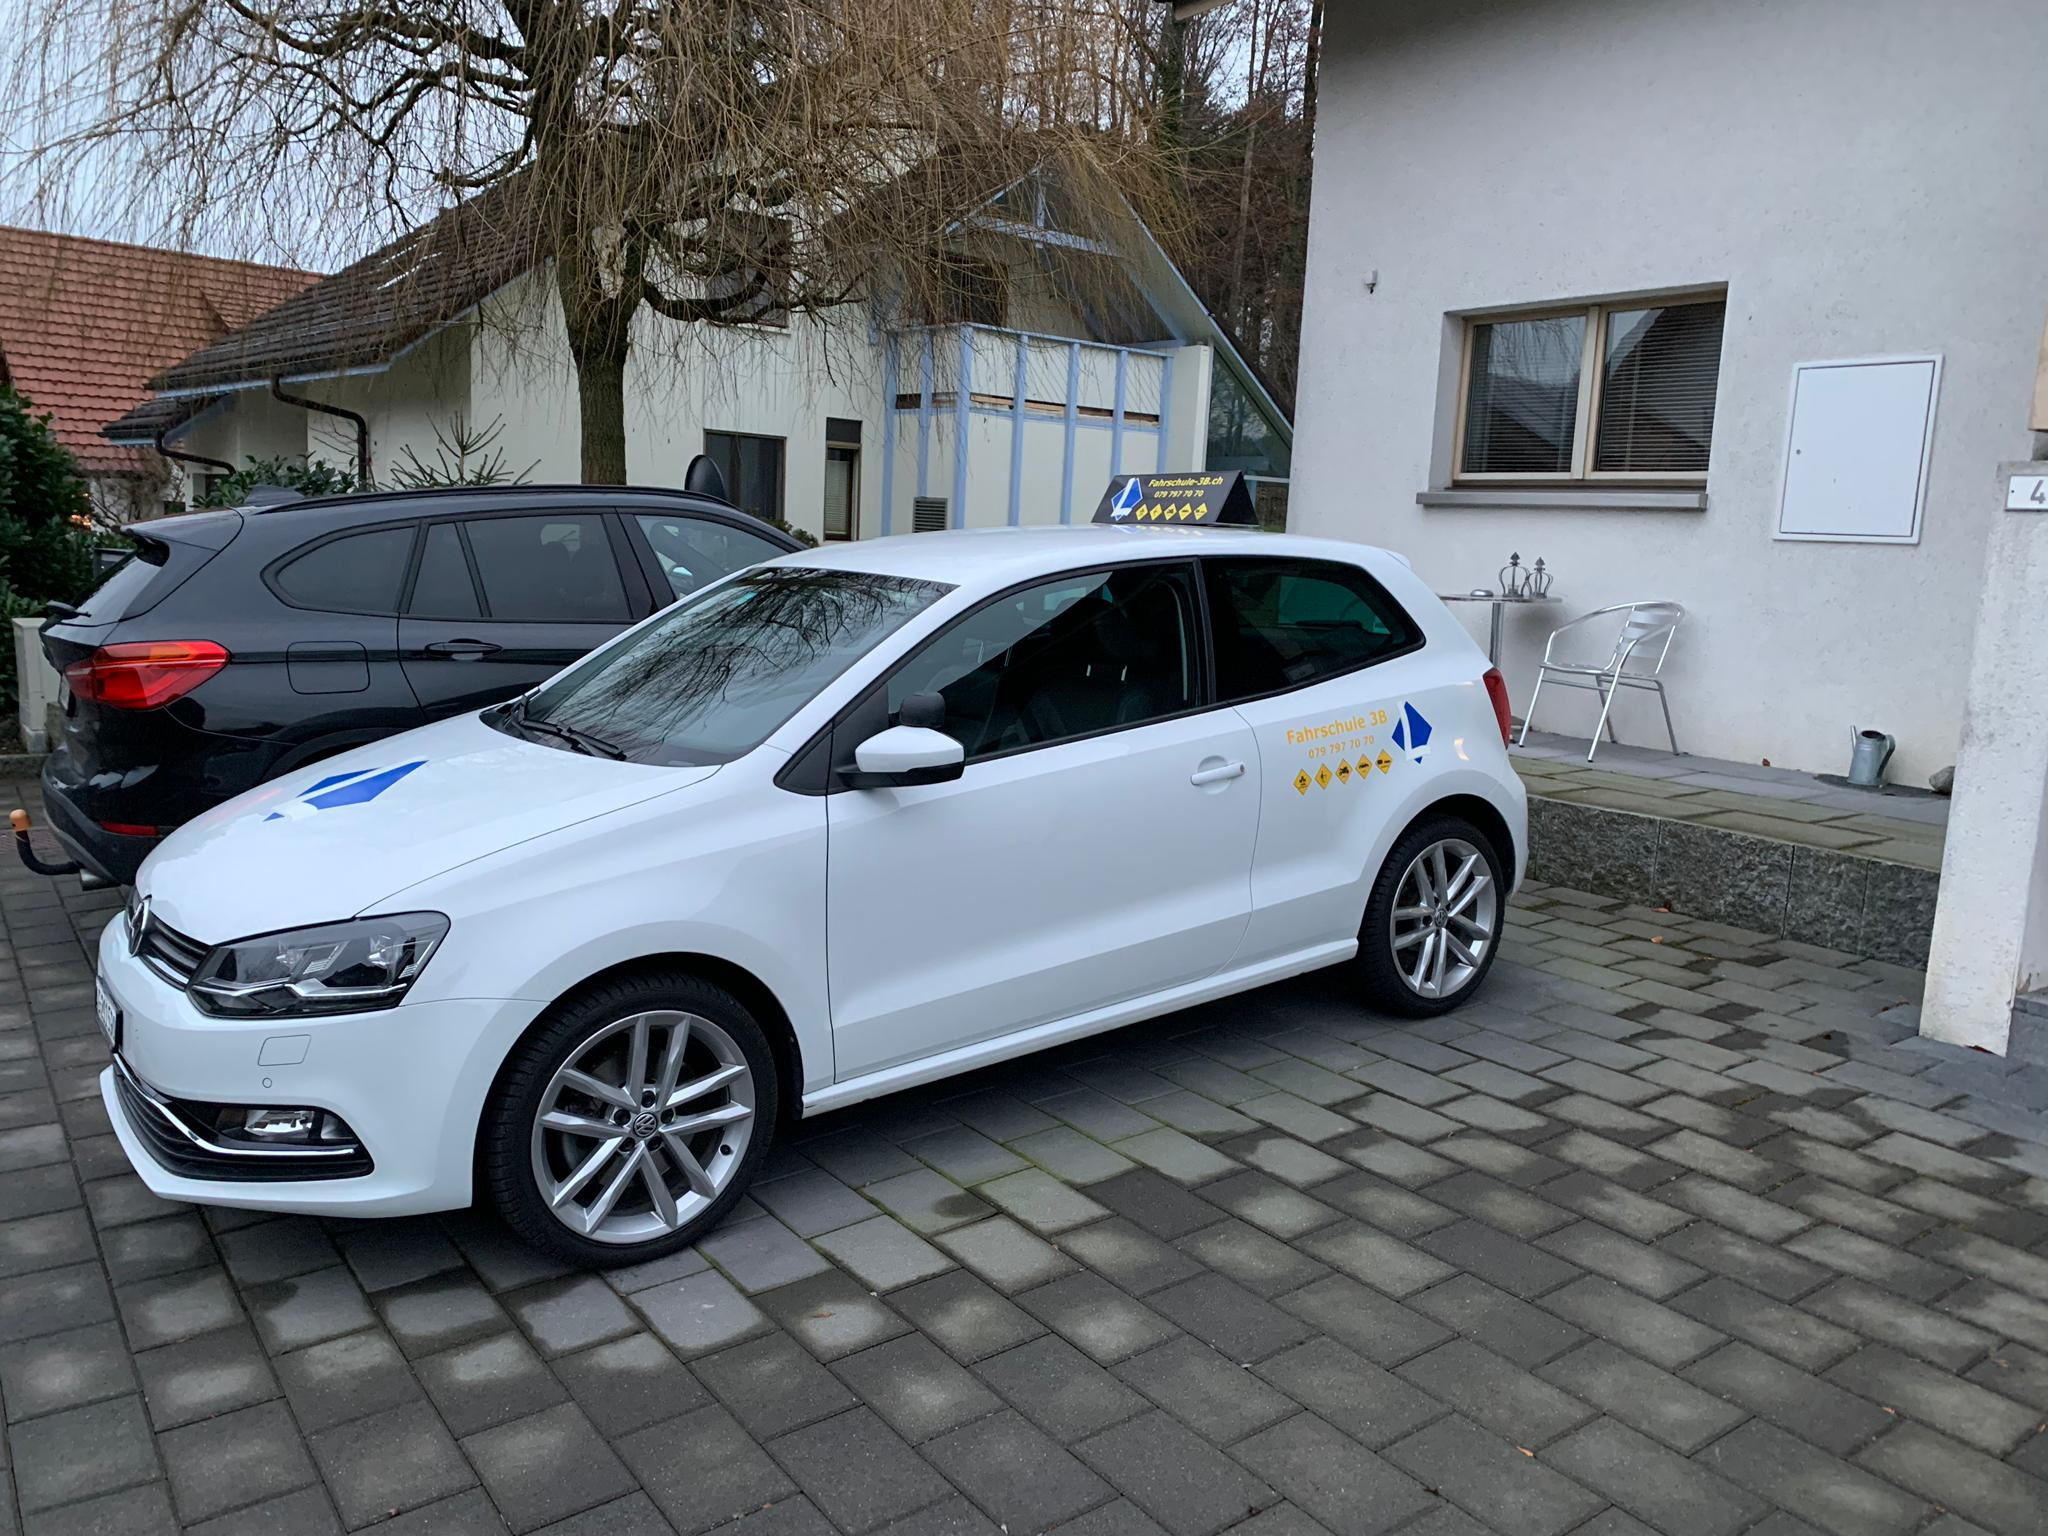 Fahrschule 3B GmbH